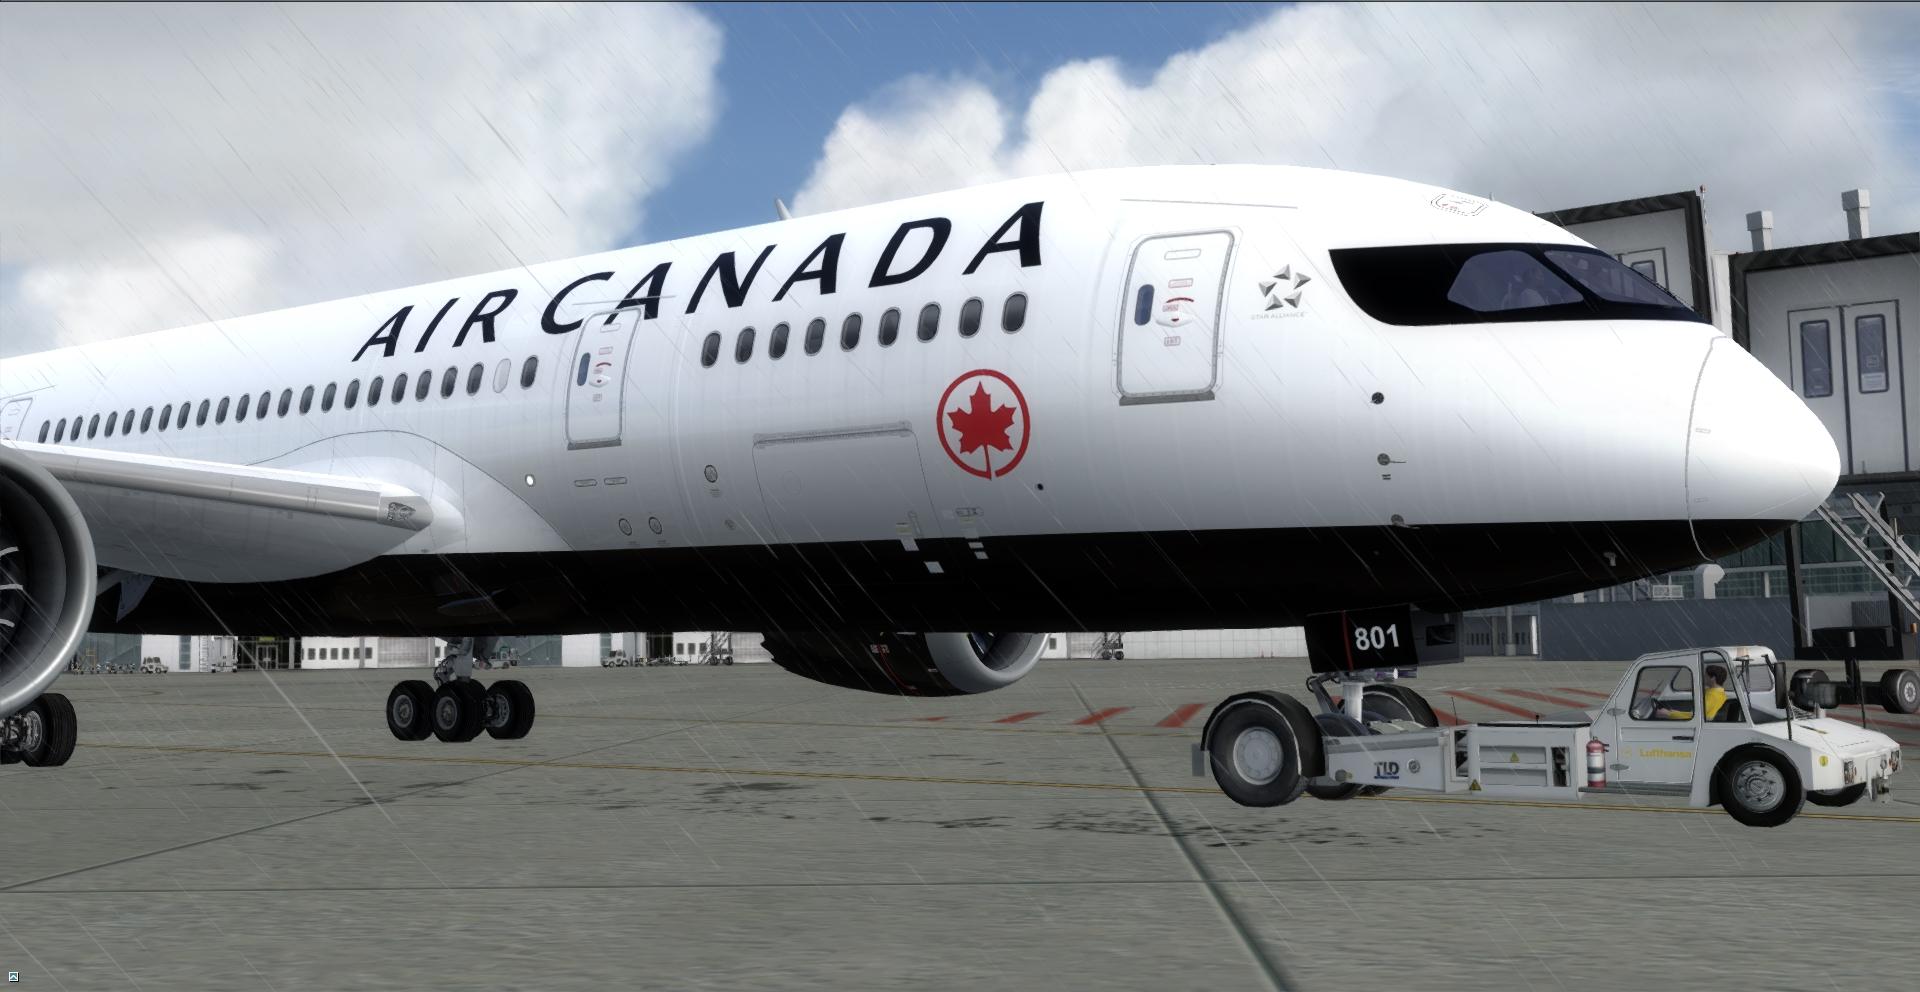 departurecheck4dkr4.jpg